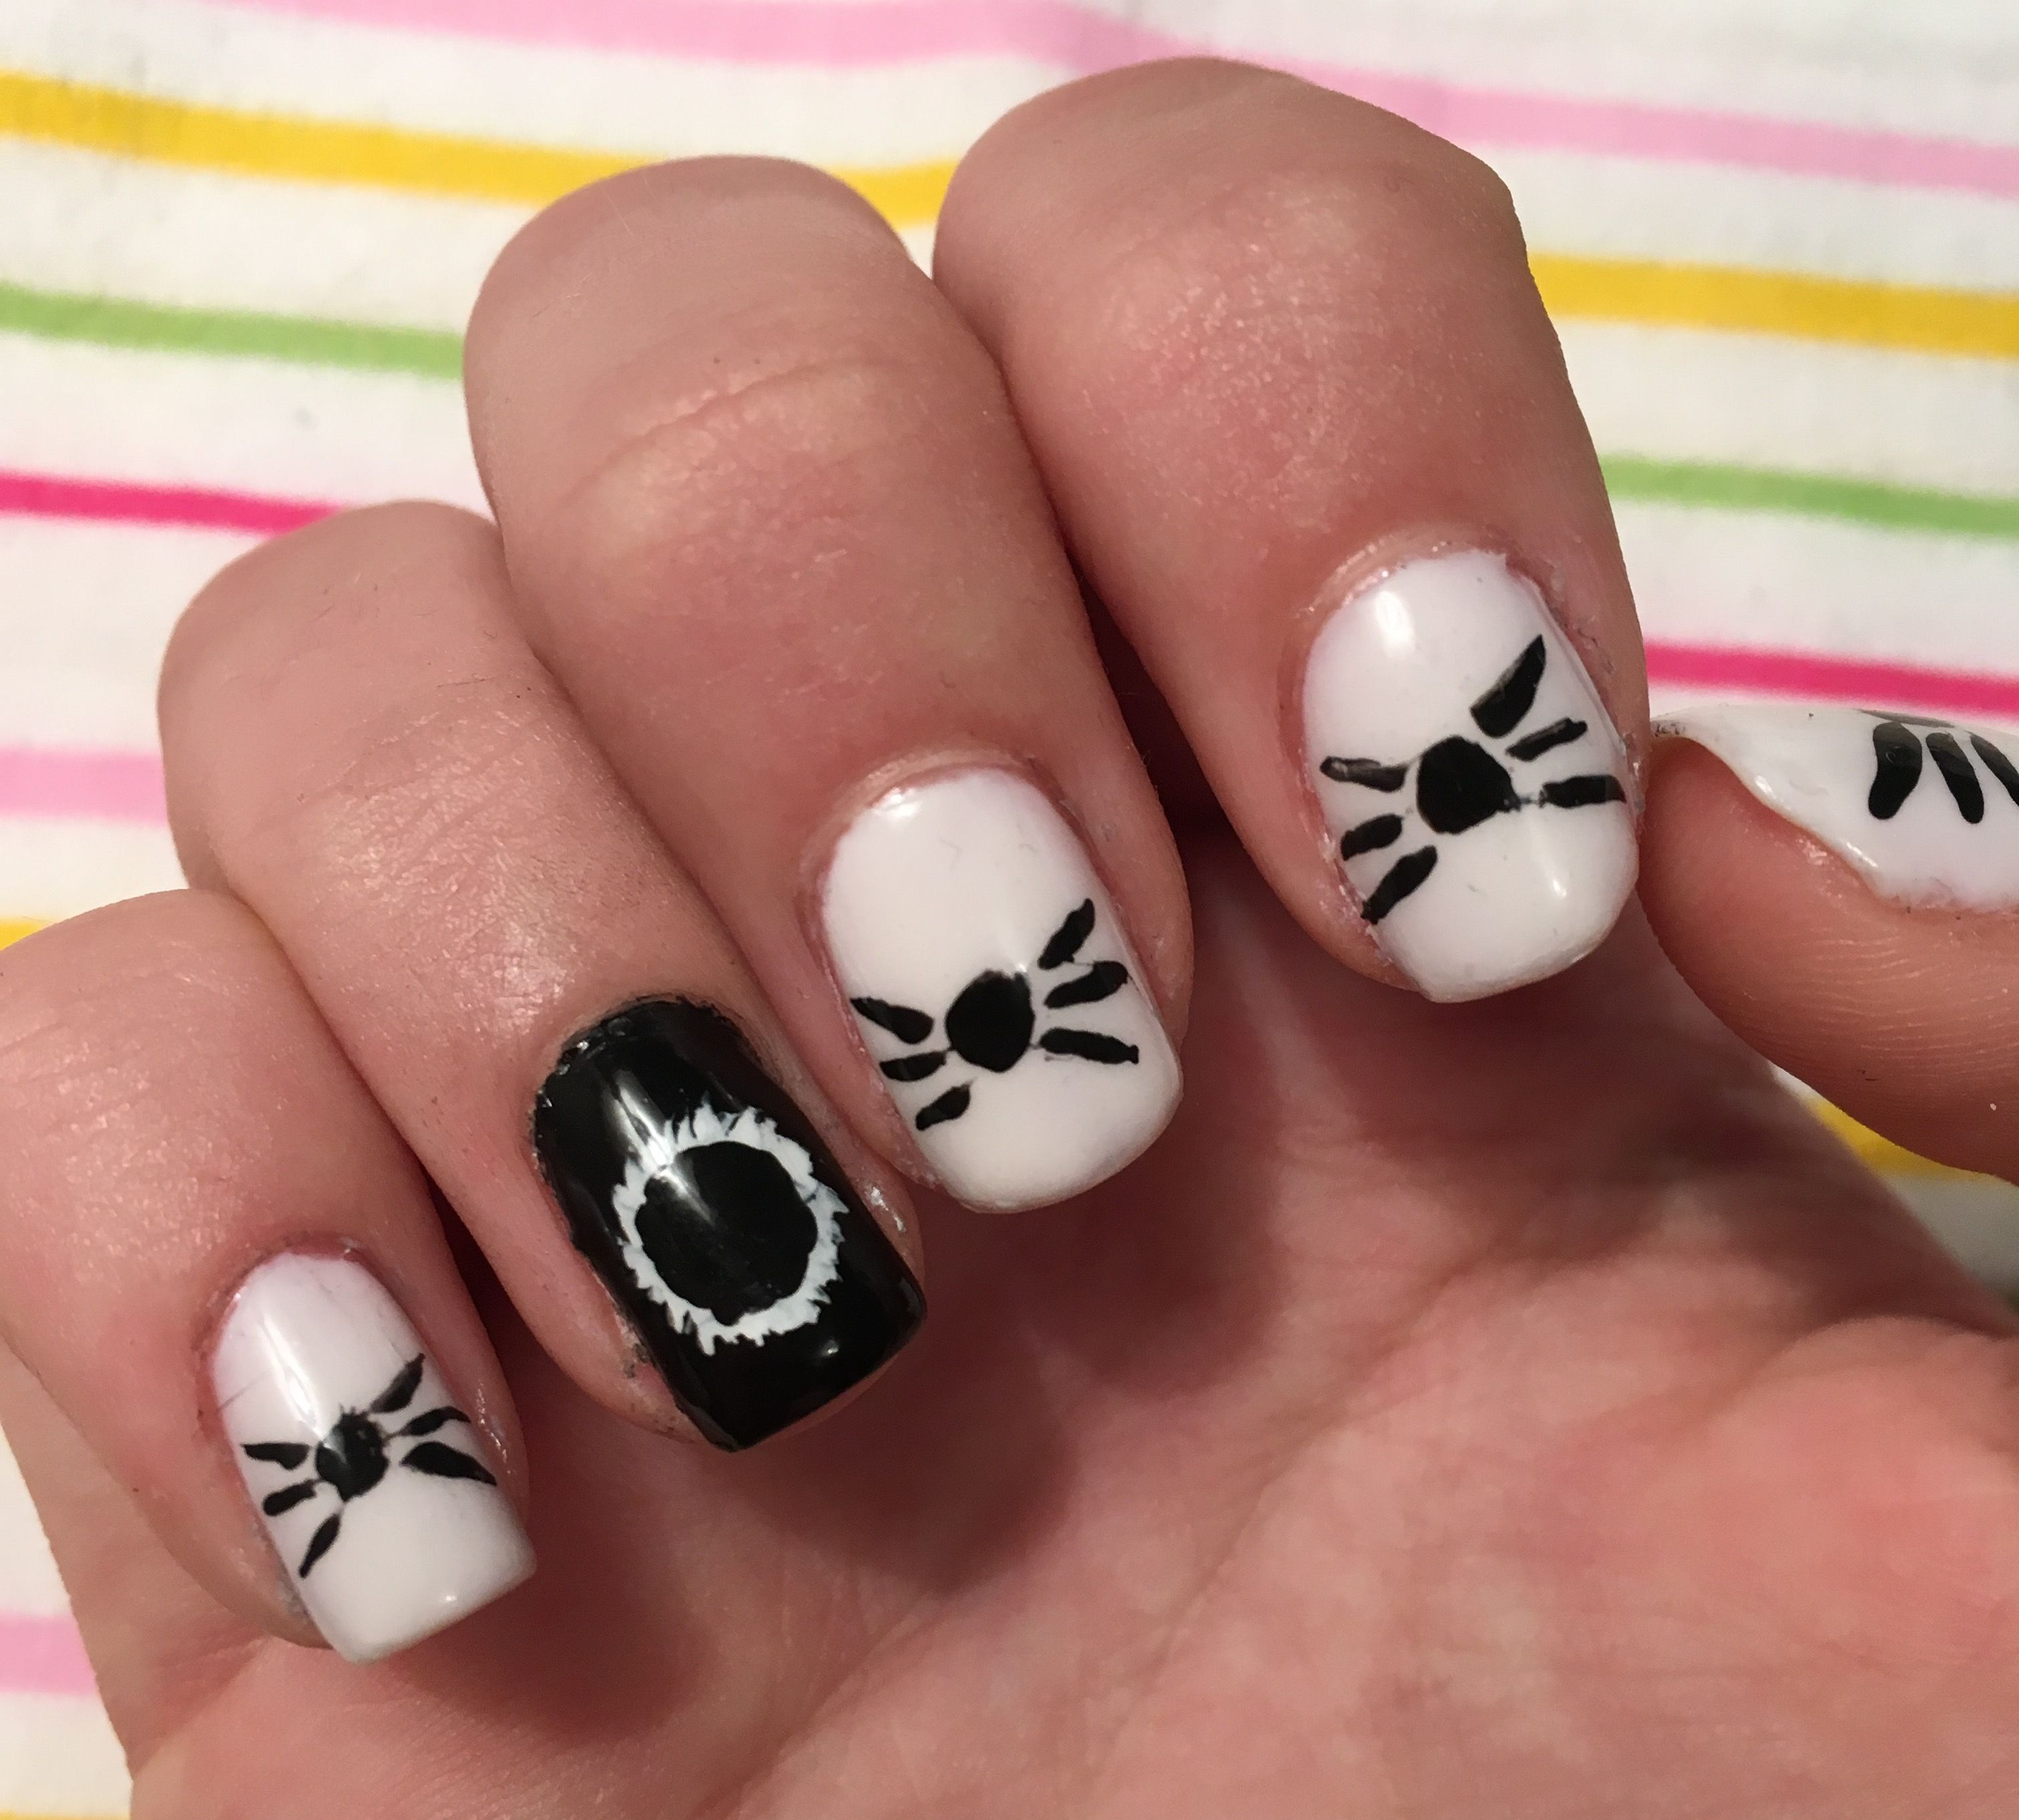 dan and phil nails - Google Search   Nails   Pinterest   Dan